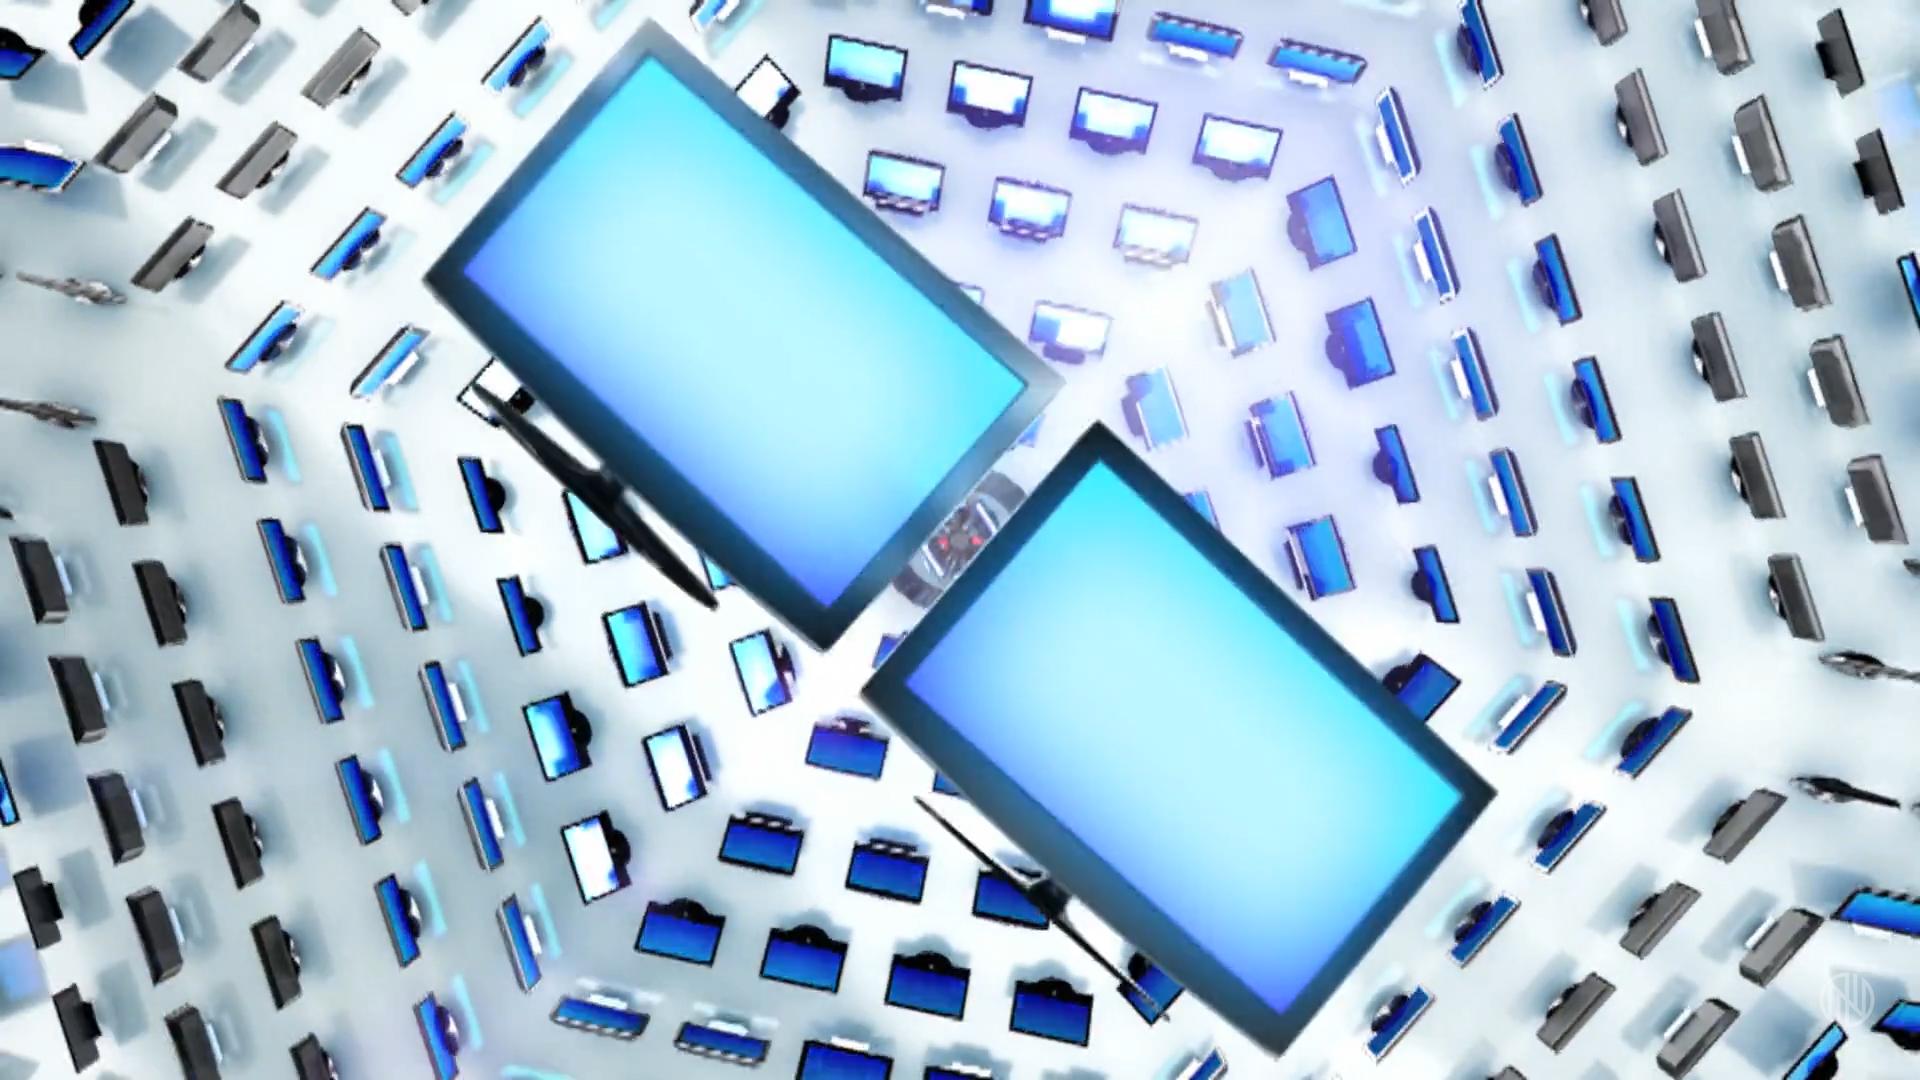 NationalTelevision_Currys HDTV-7.jpg